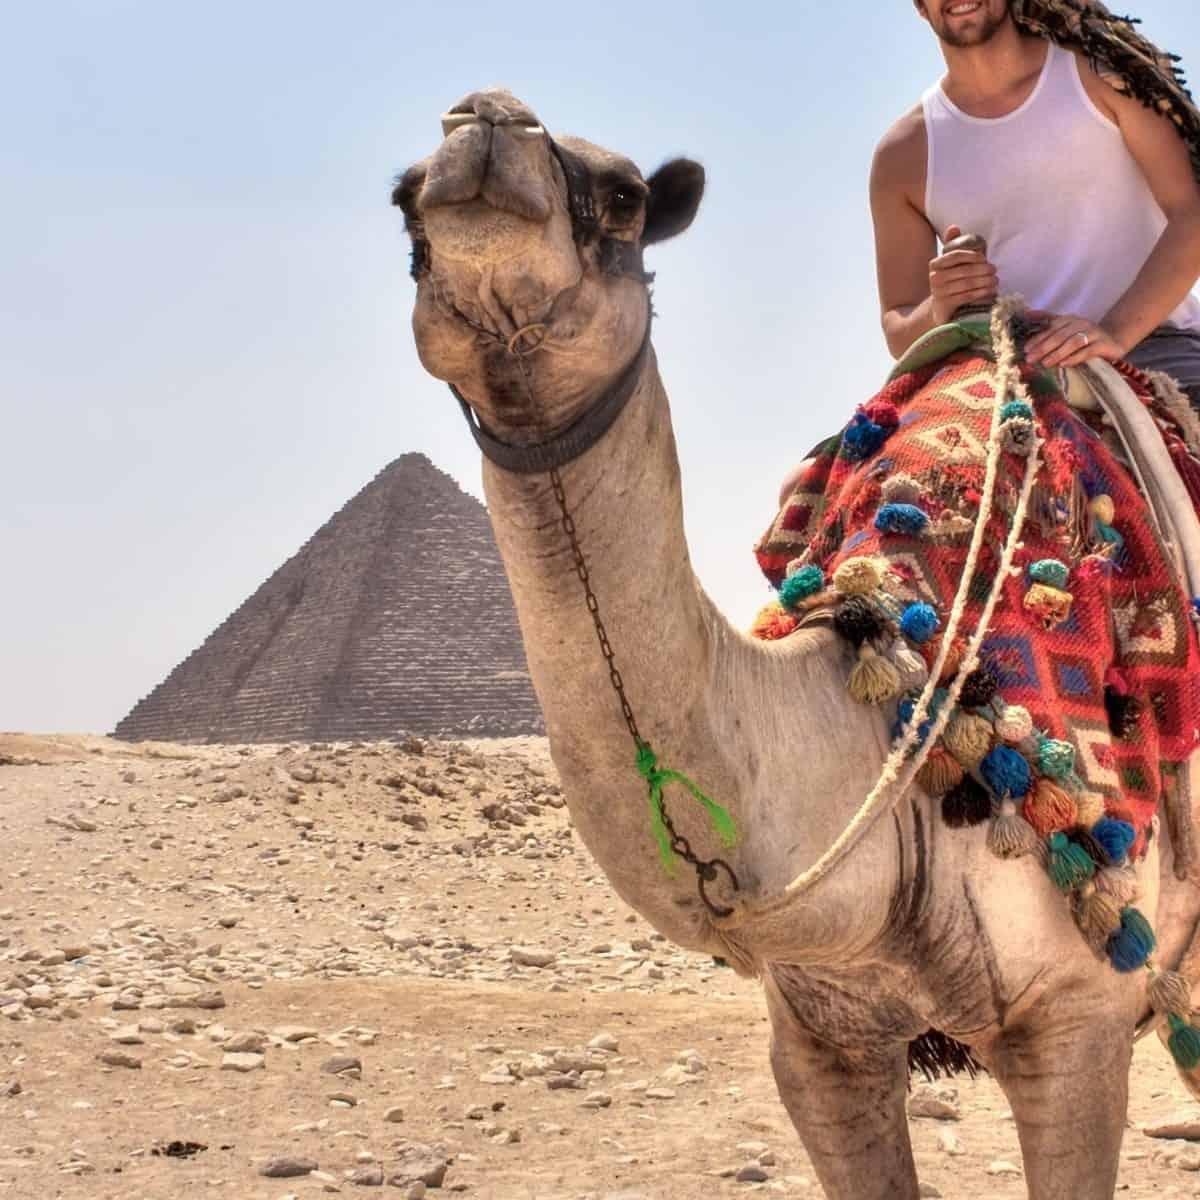 Hombre Egipto Camello Planesturisticos.com - Turquía Y Egipto 17 Días 15 Noches   Vuelos Desde Bogotá   Hasta Diciembre 2021